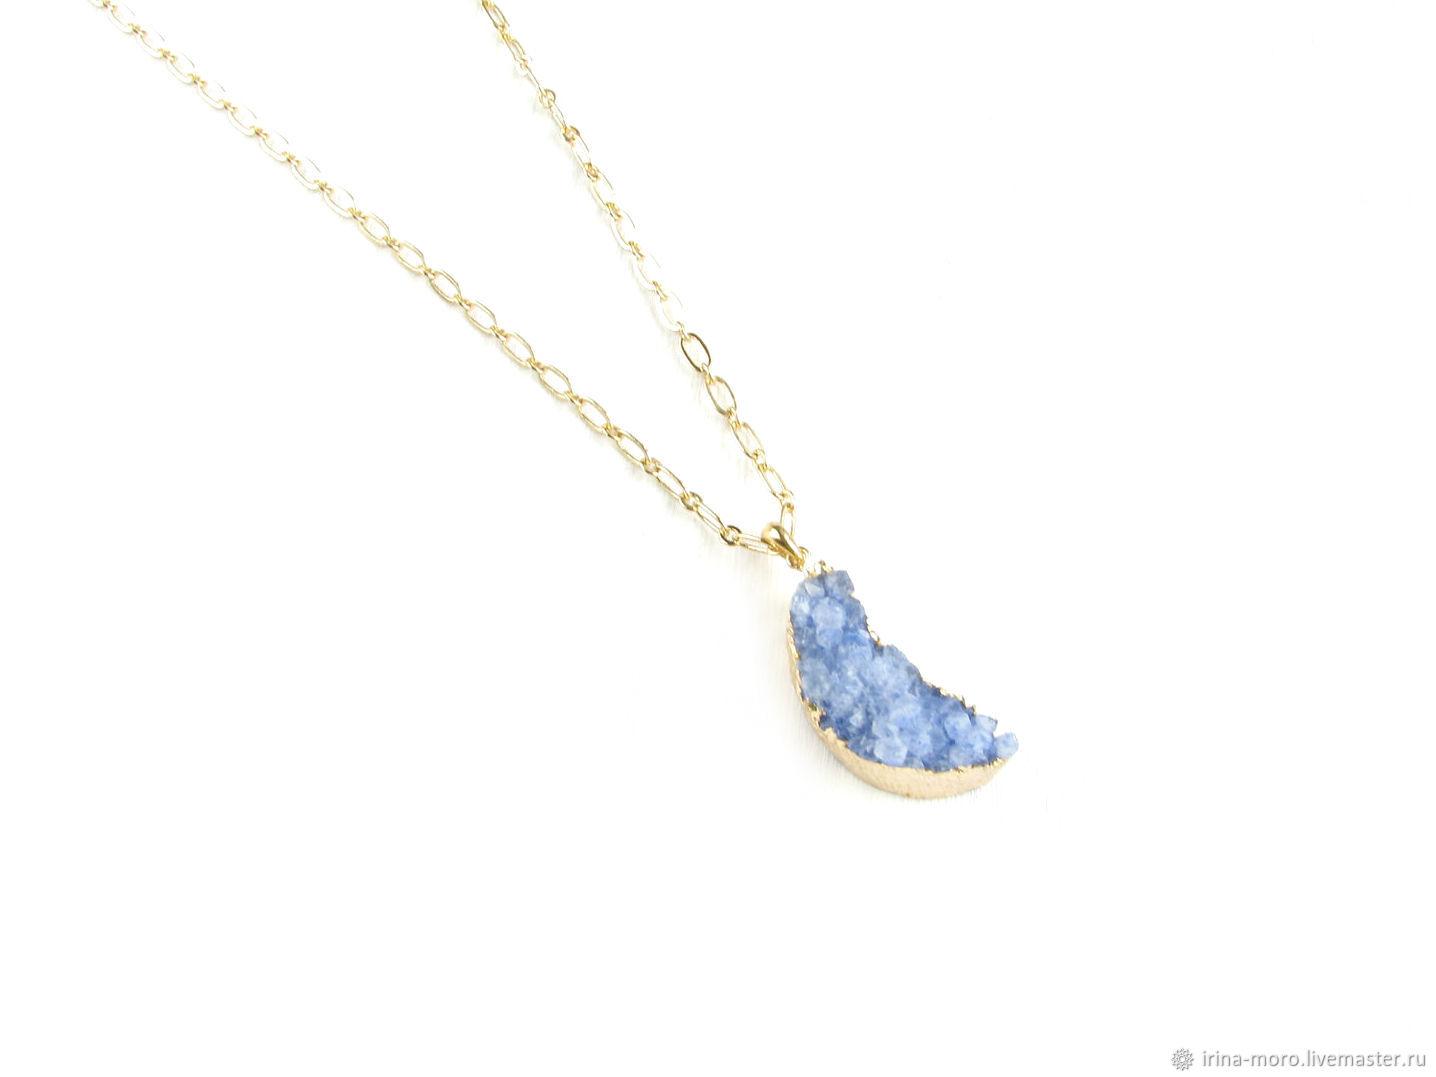 Blue pendant 'Month' Druze agate, pendant pendant on a chain, Pendants, Moscow,  Фото №1